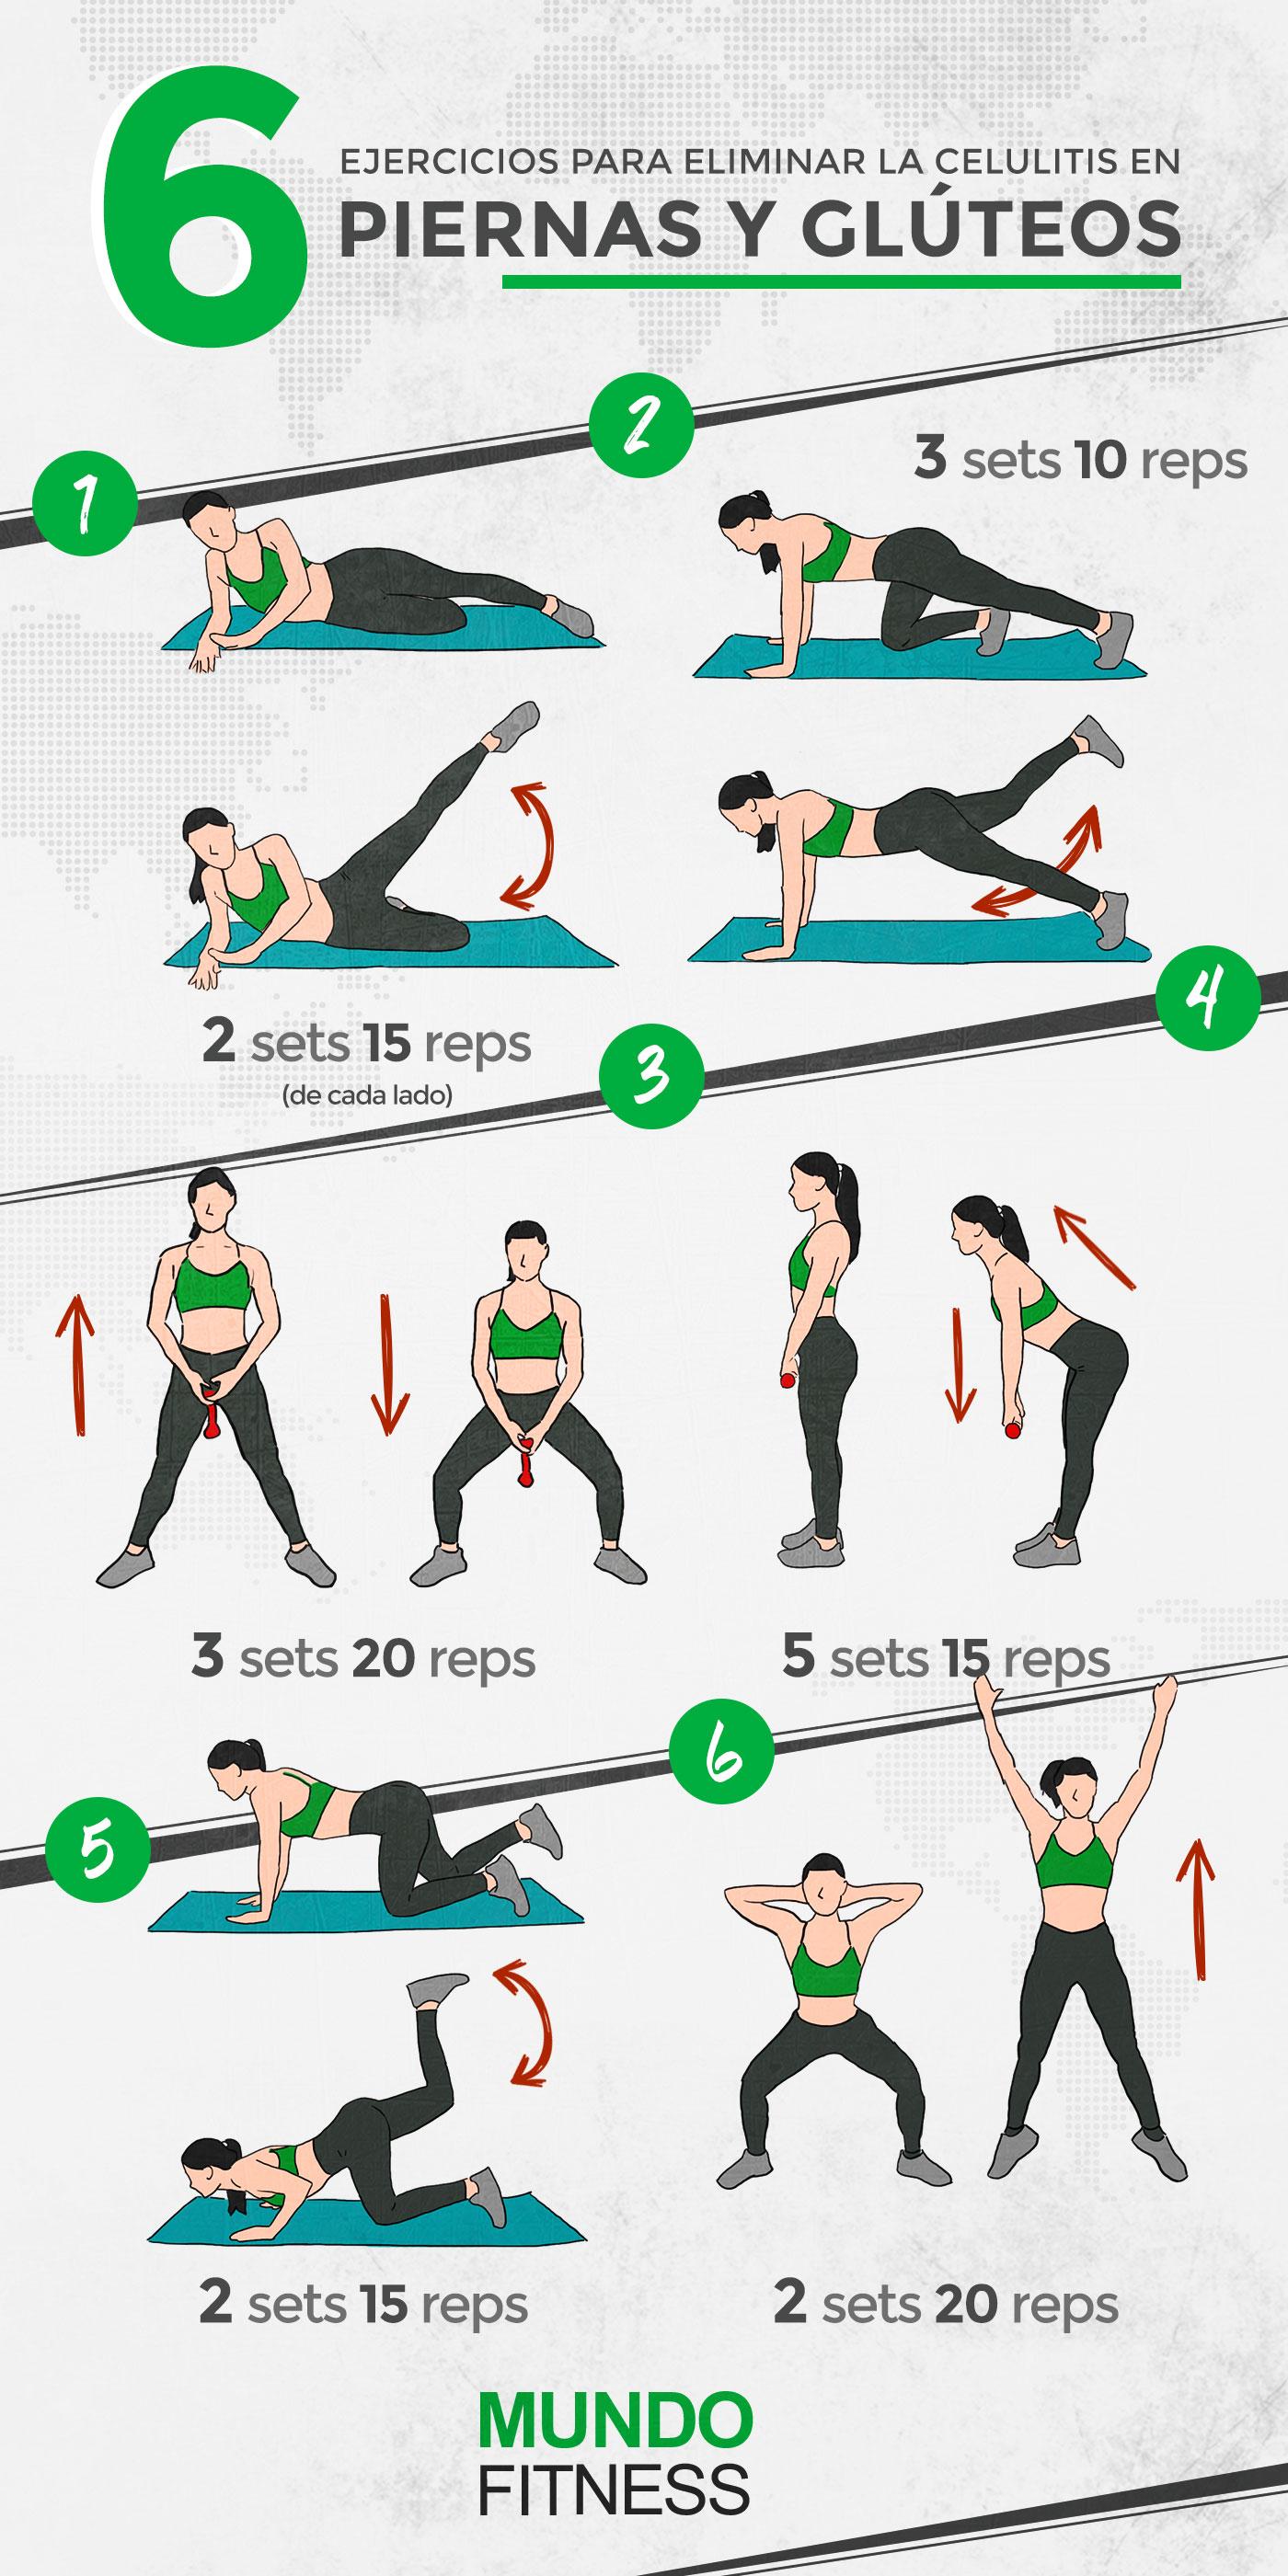 ejercicios-para-eliminar-la-celulitis-infografia